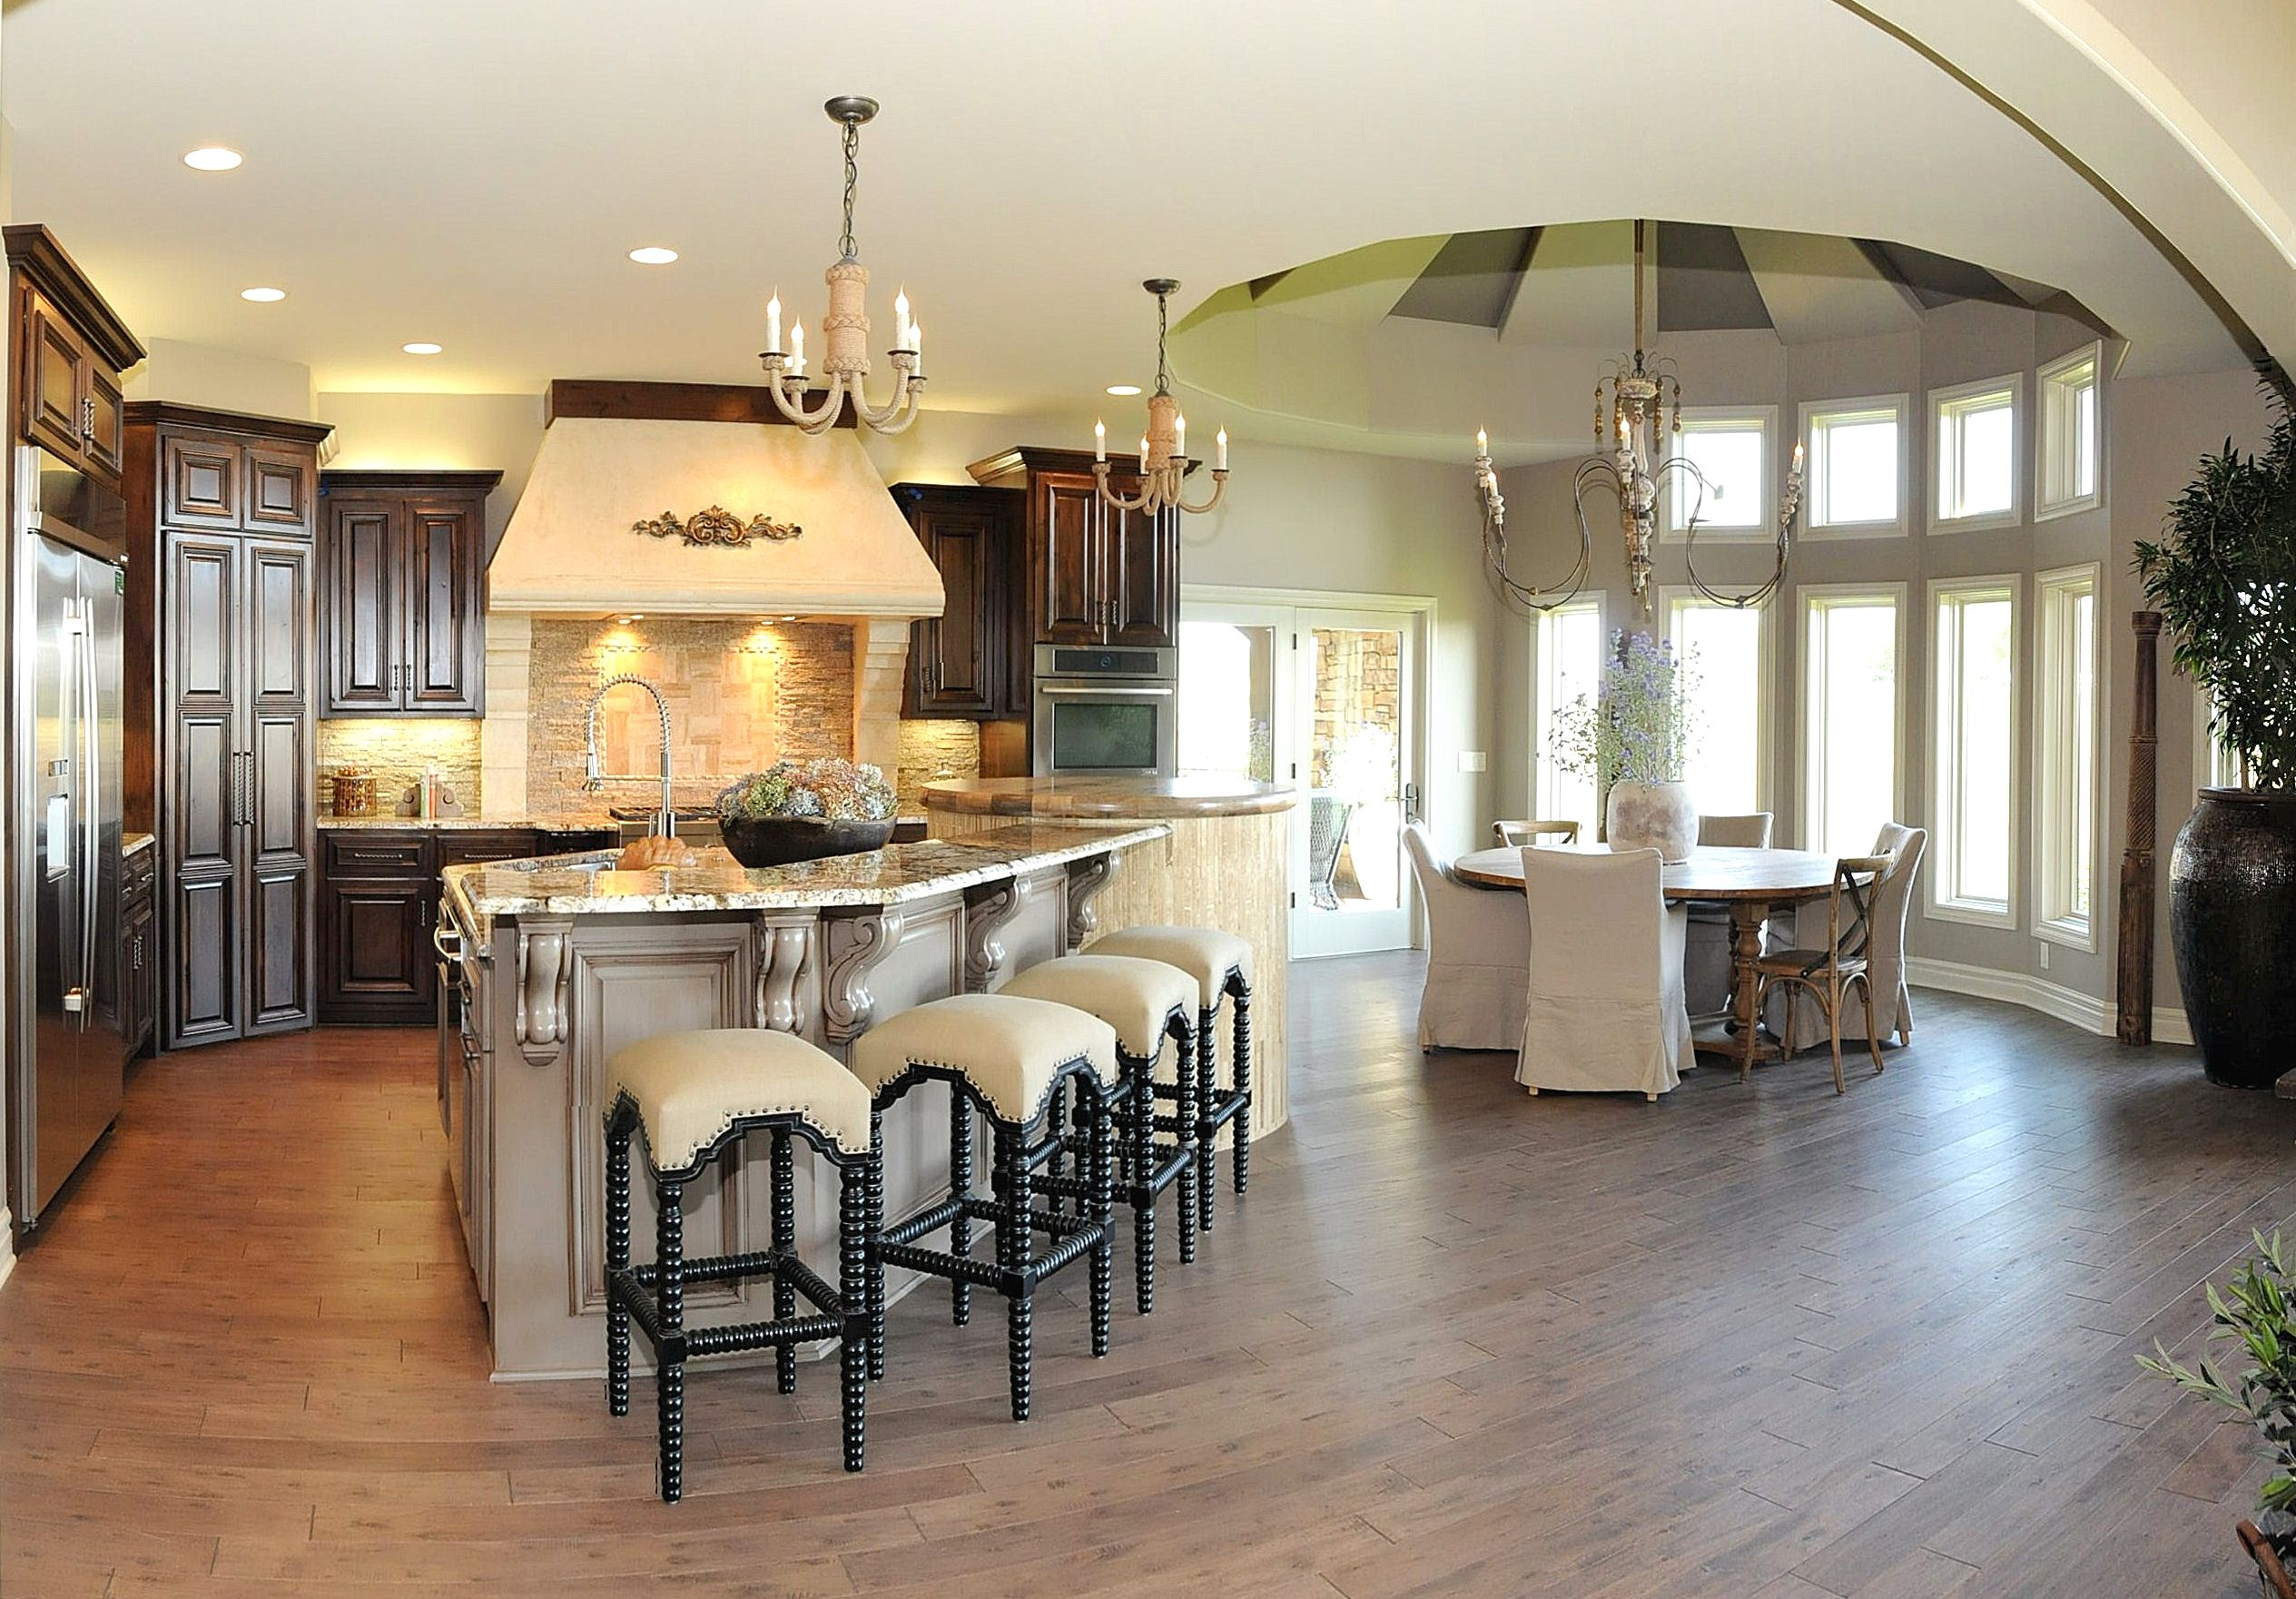 Kitchen street of dreams omaha home design decor